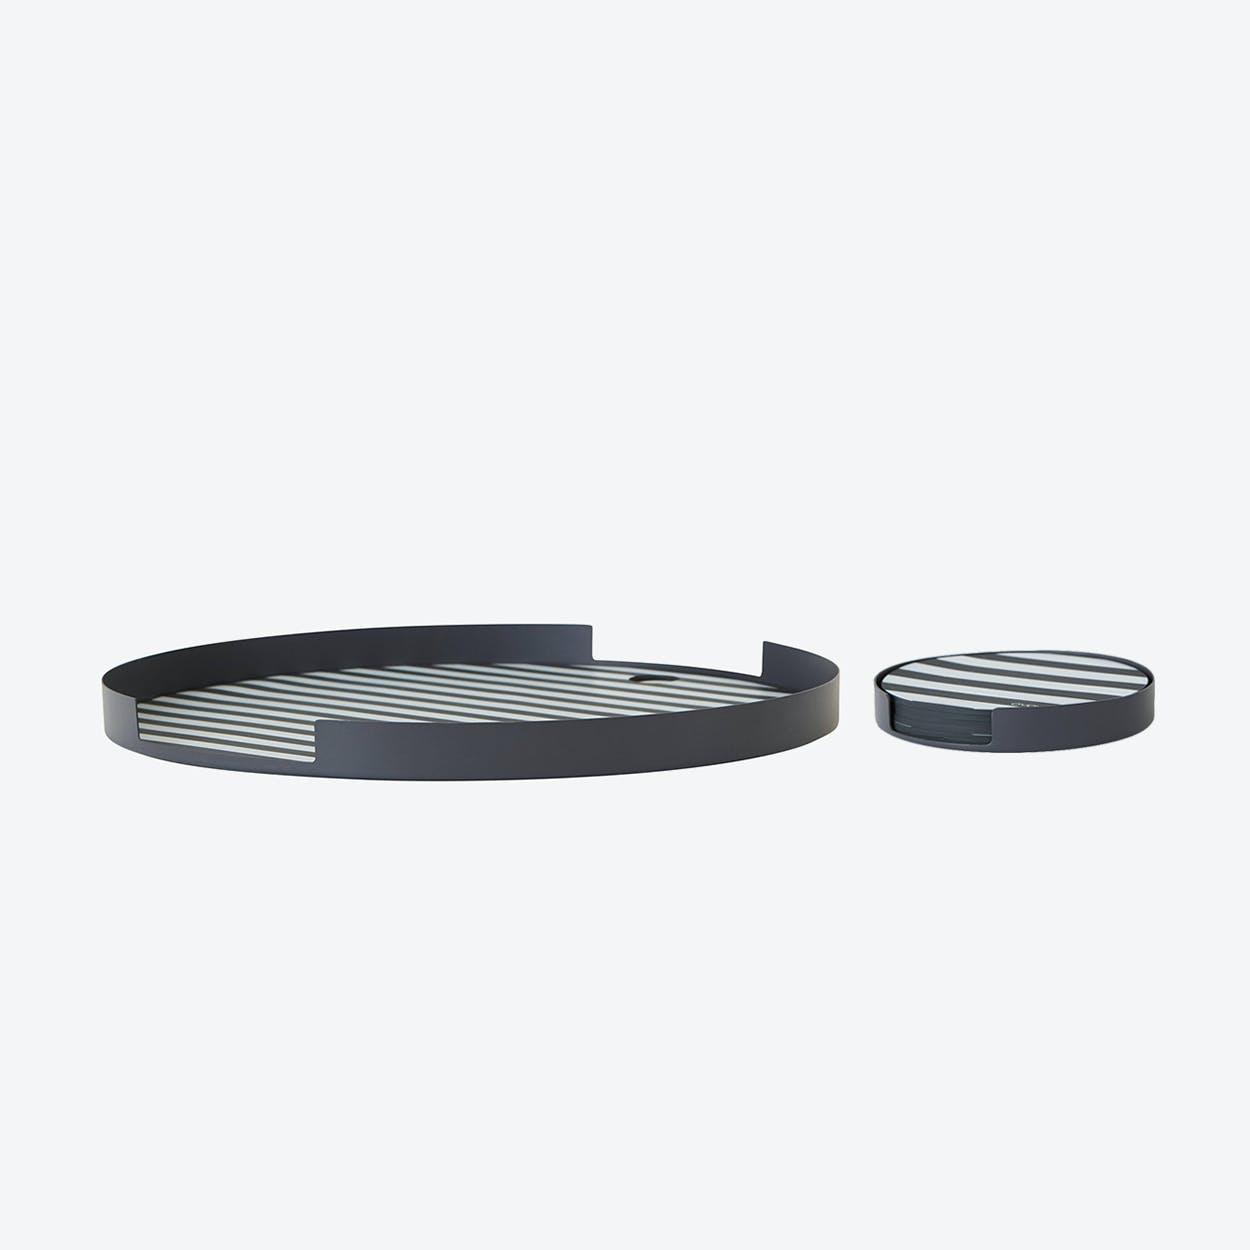 Oka Coaster & Tray Set in Anthracite